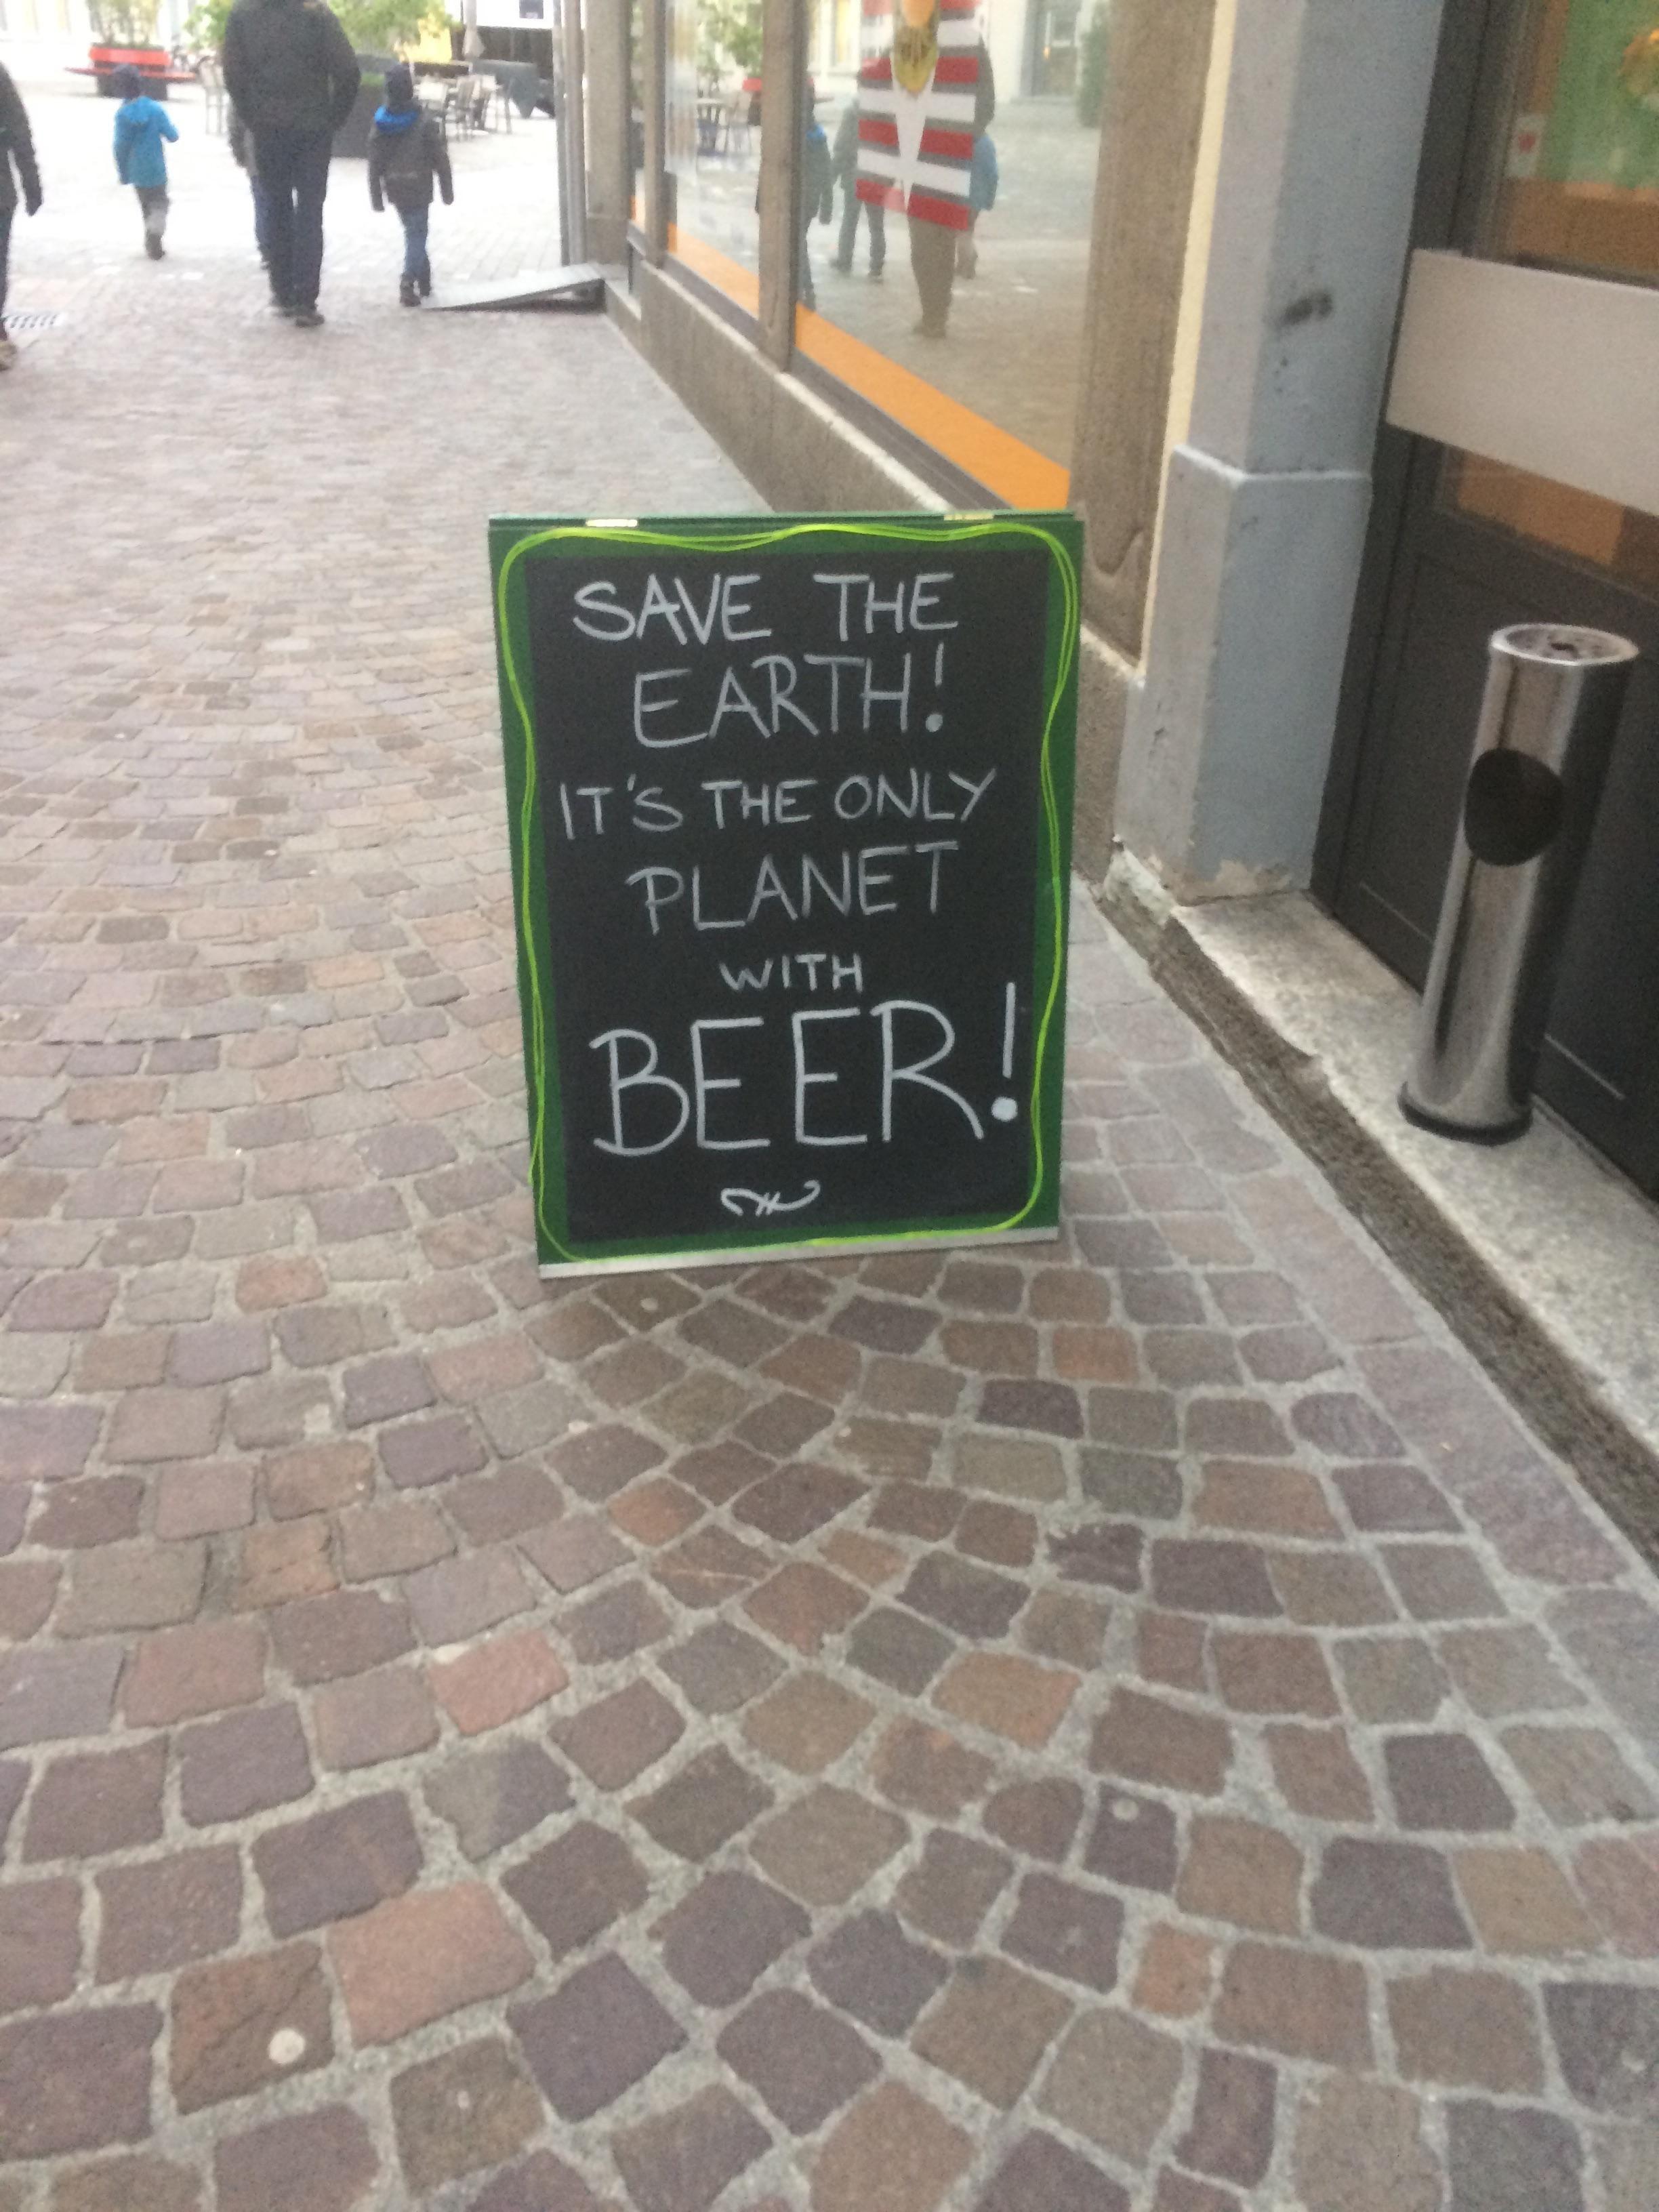 Had a good chuckle walking past a local Pub